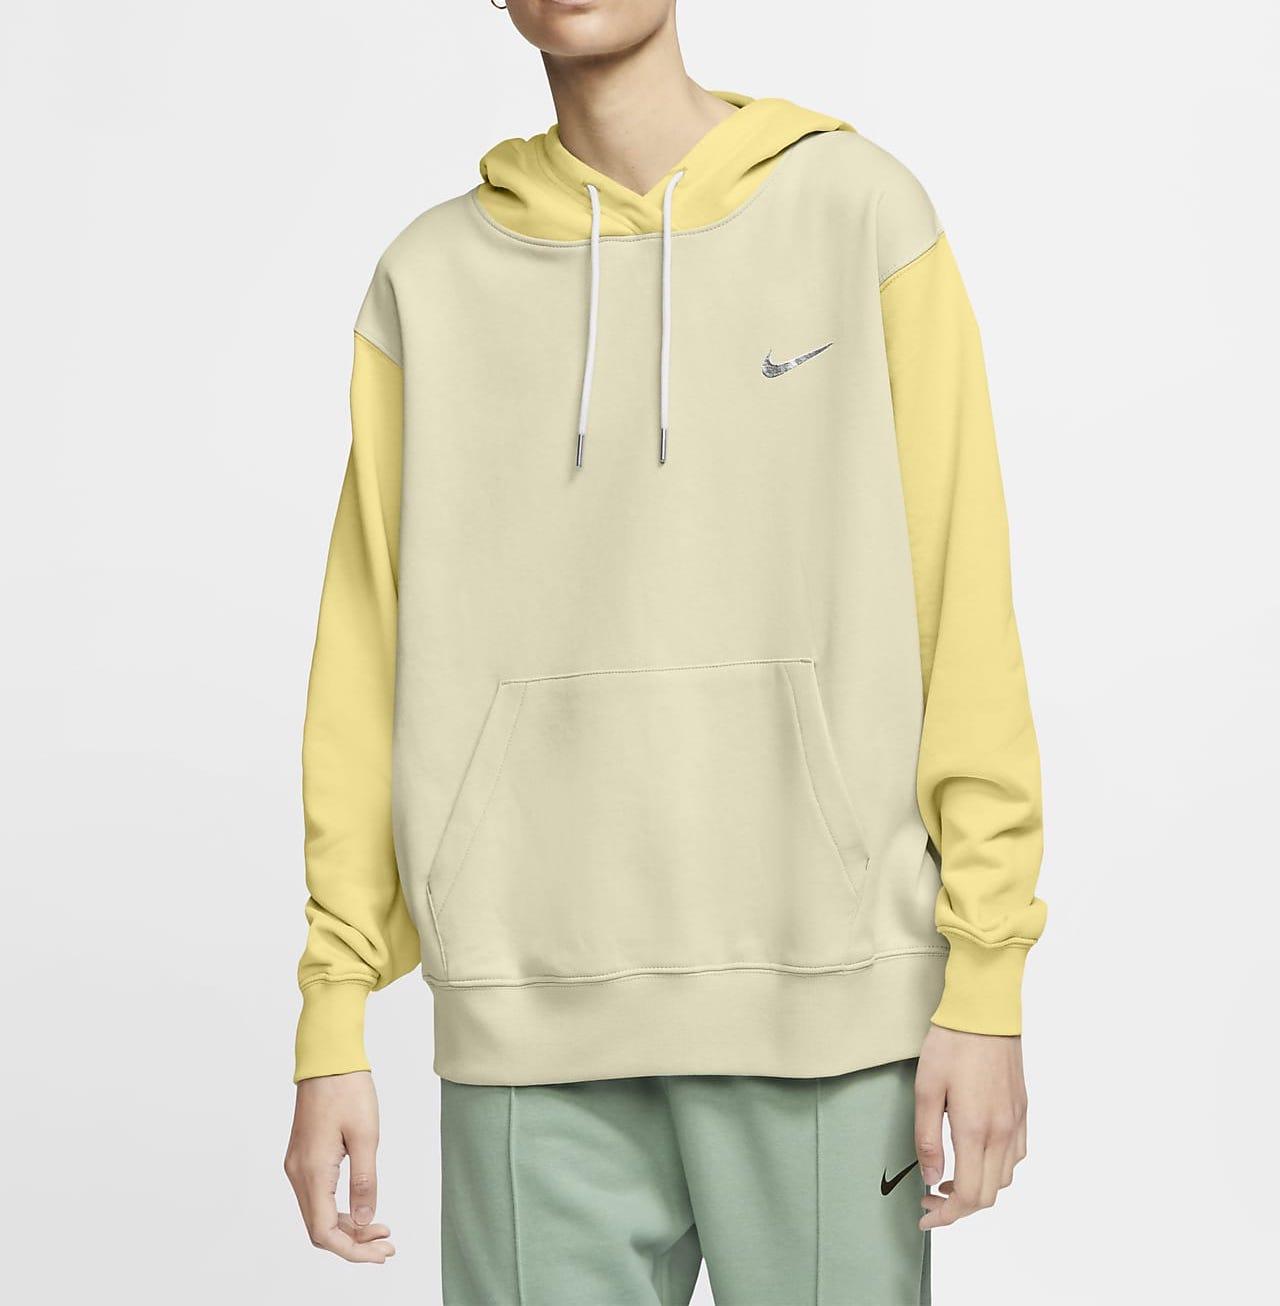 Nike Sportswear Swoosh Hoodie Yellow